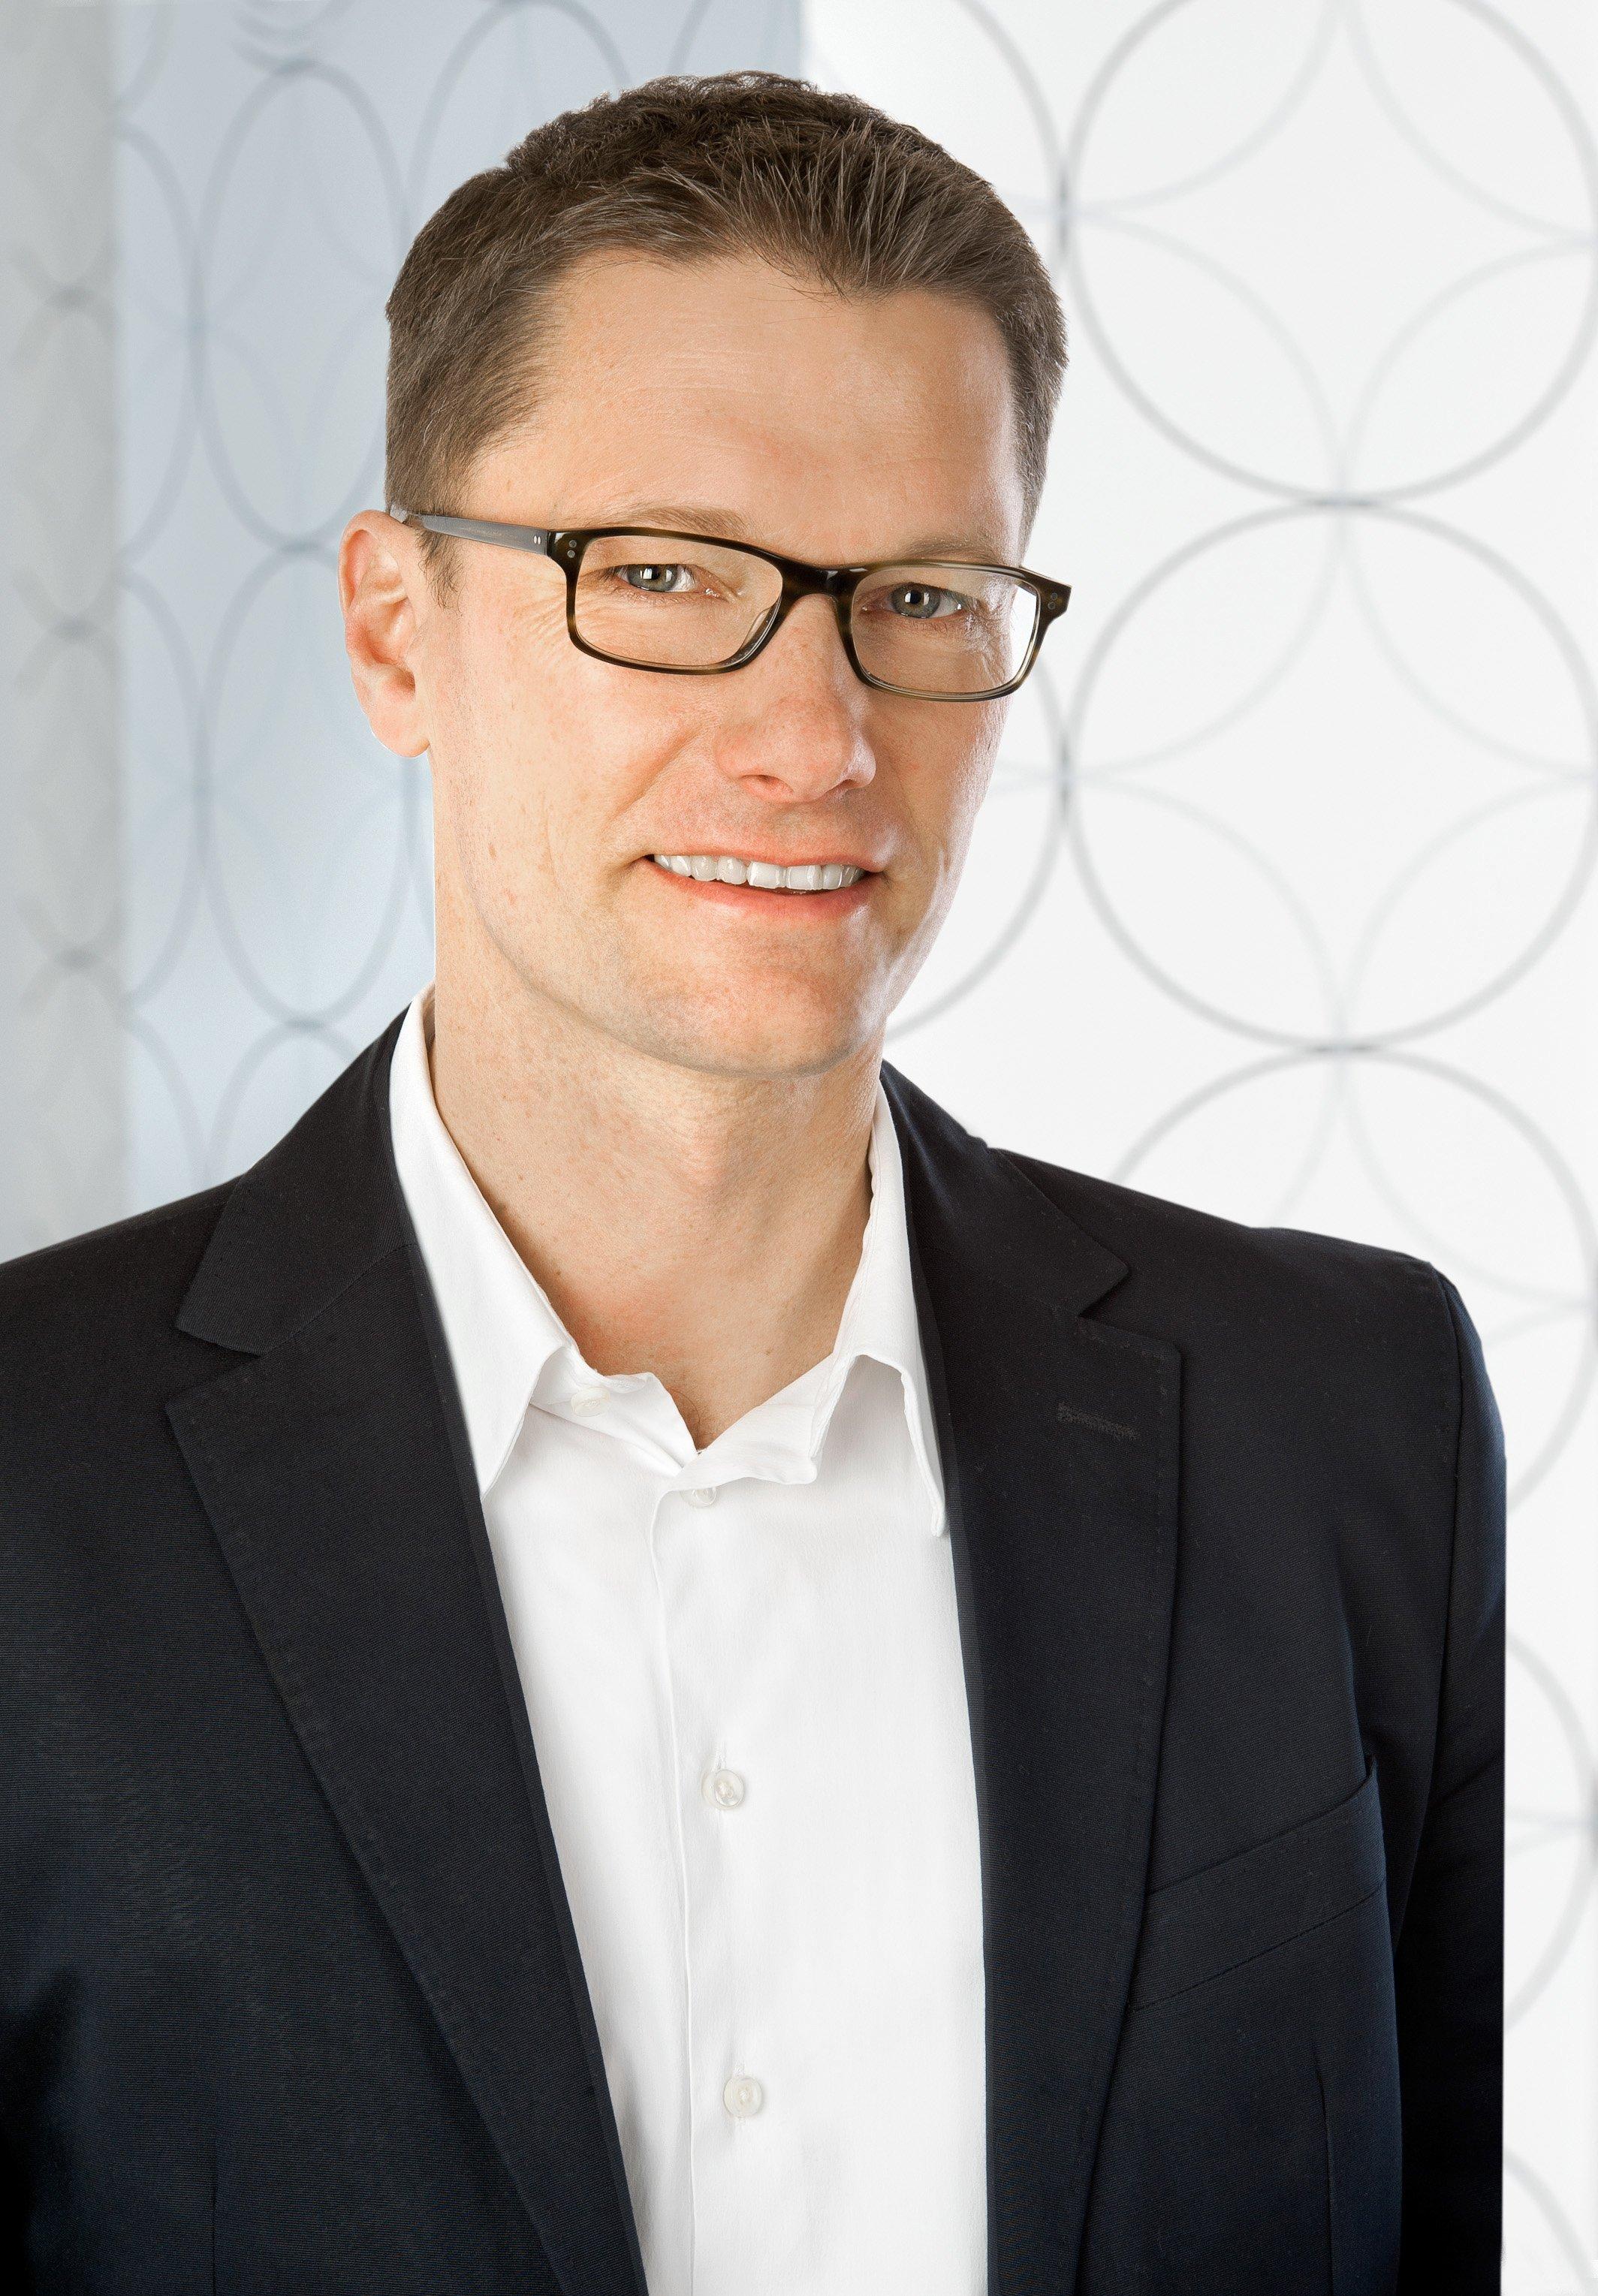 Sascha Wellershoff, CFO of the Retarus Group © Retarus Group